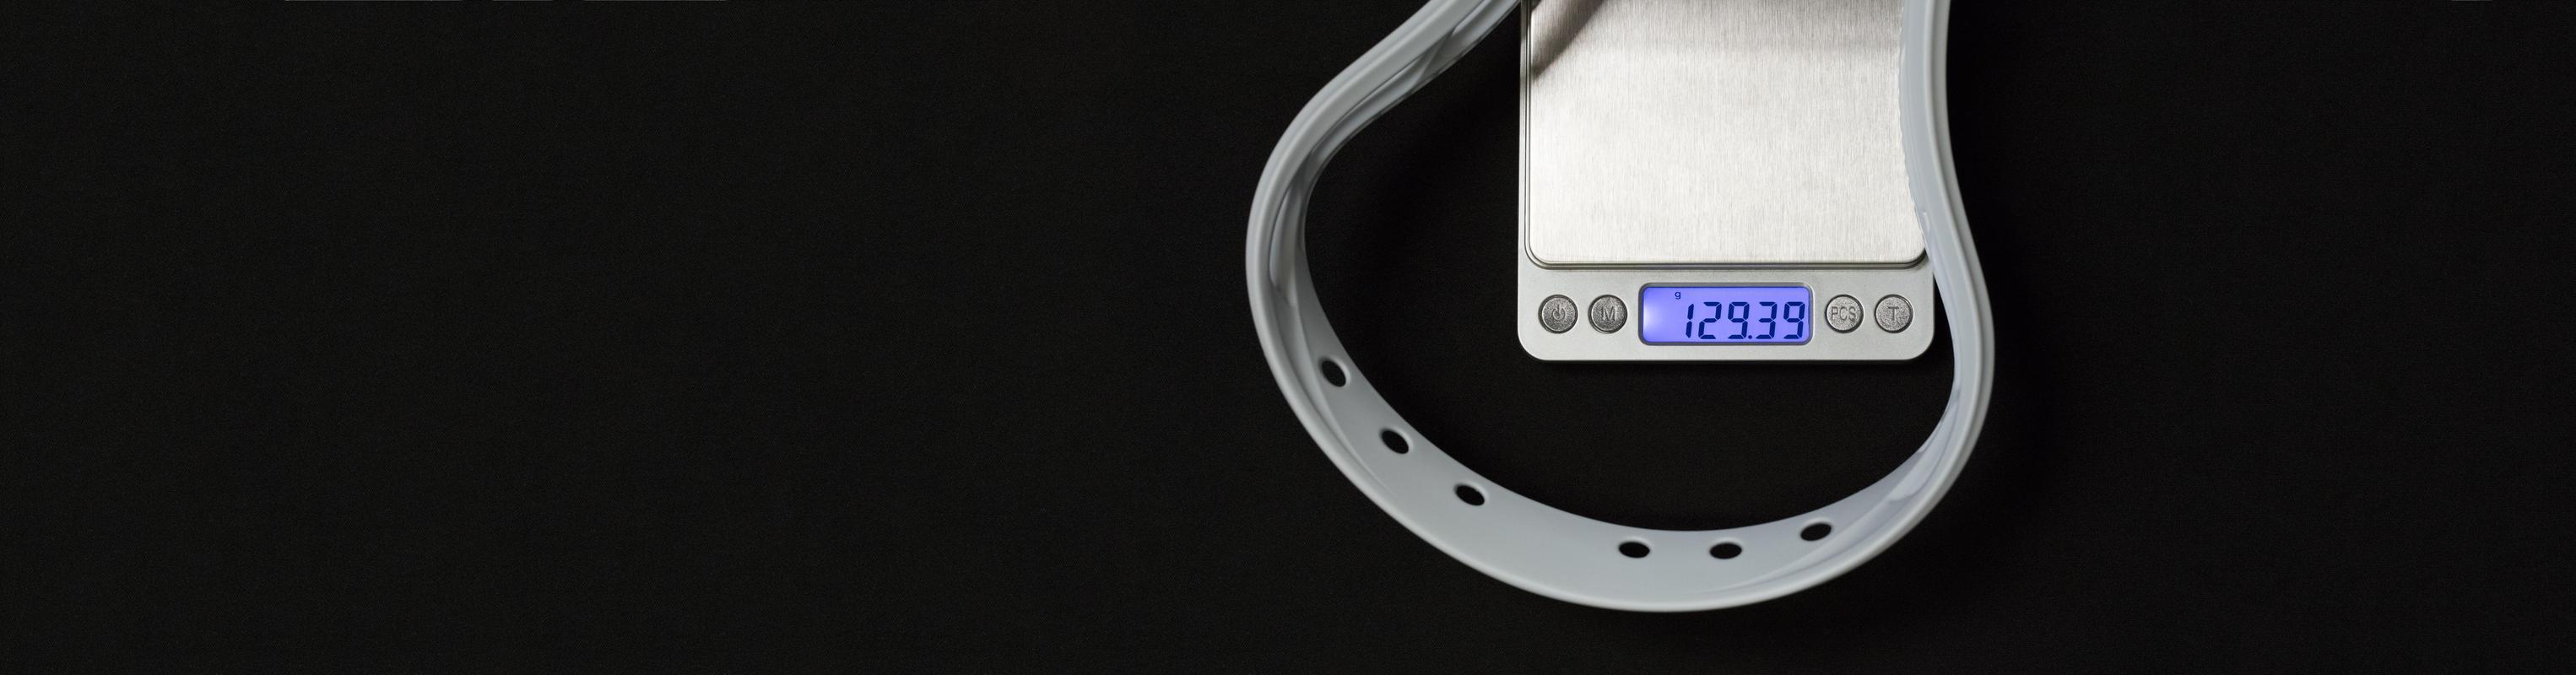 StringKing Mark 2A Men's Attack Lacrosse Head Lighter on Scale